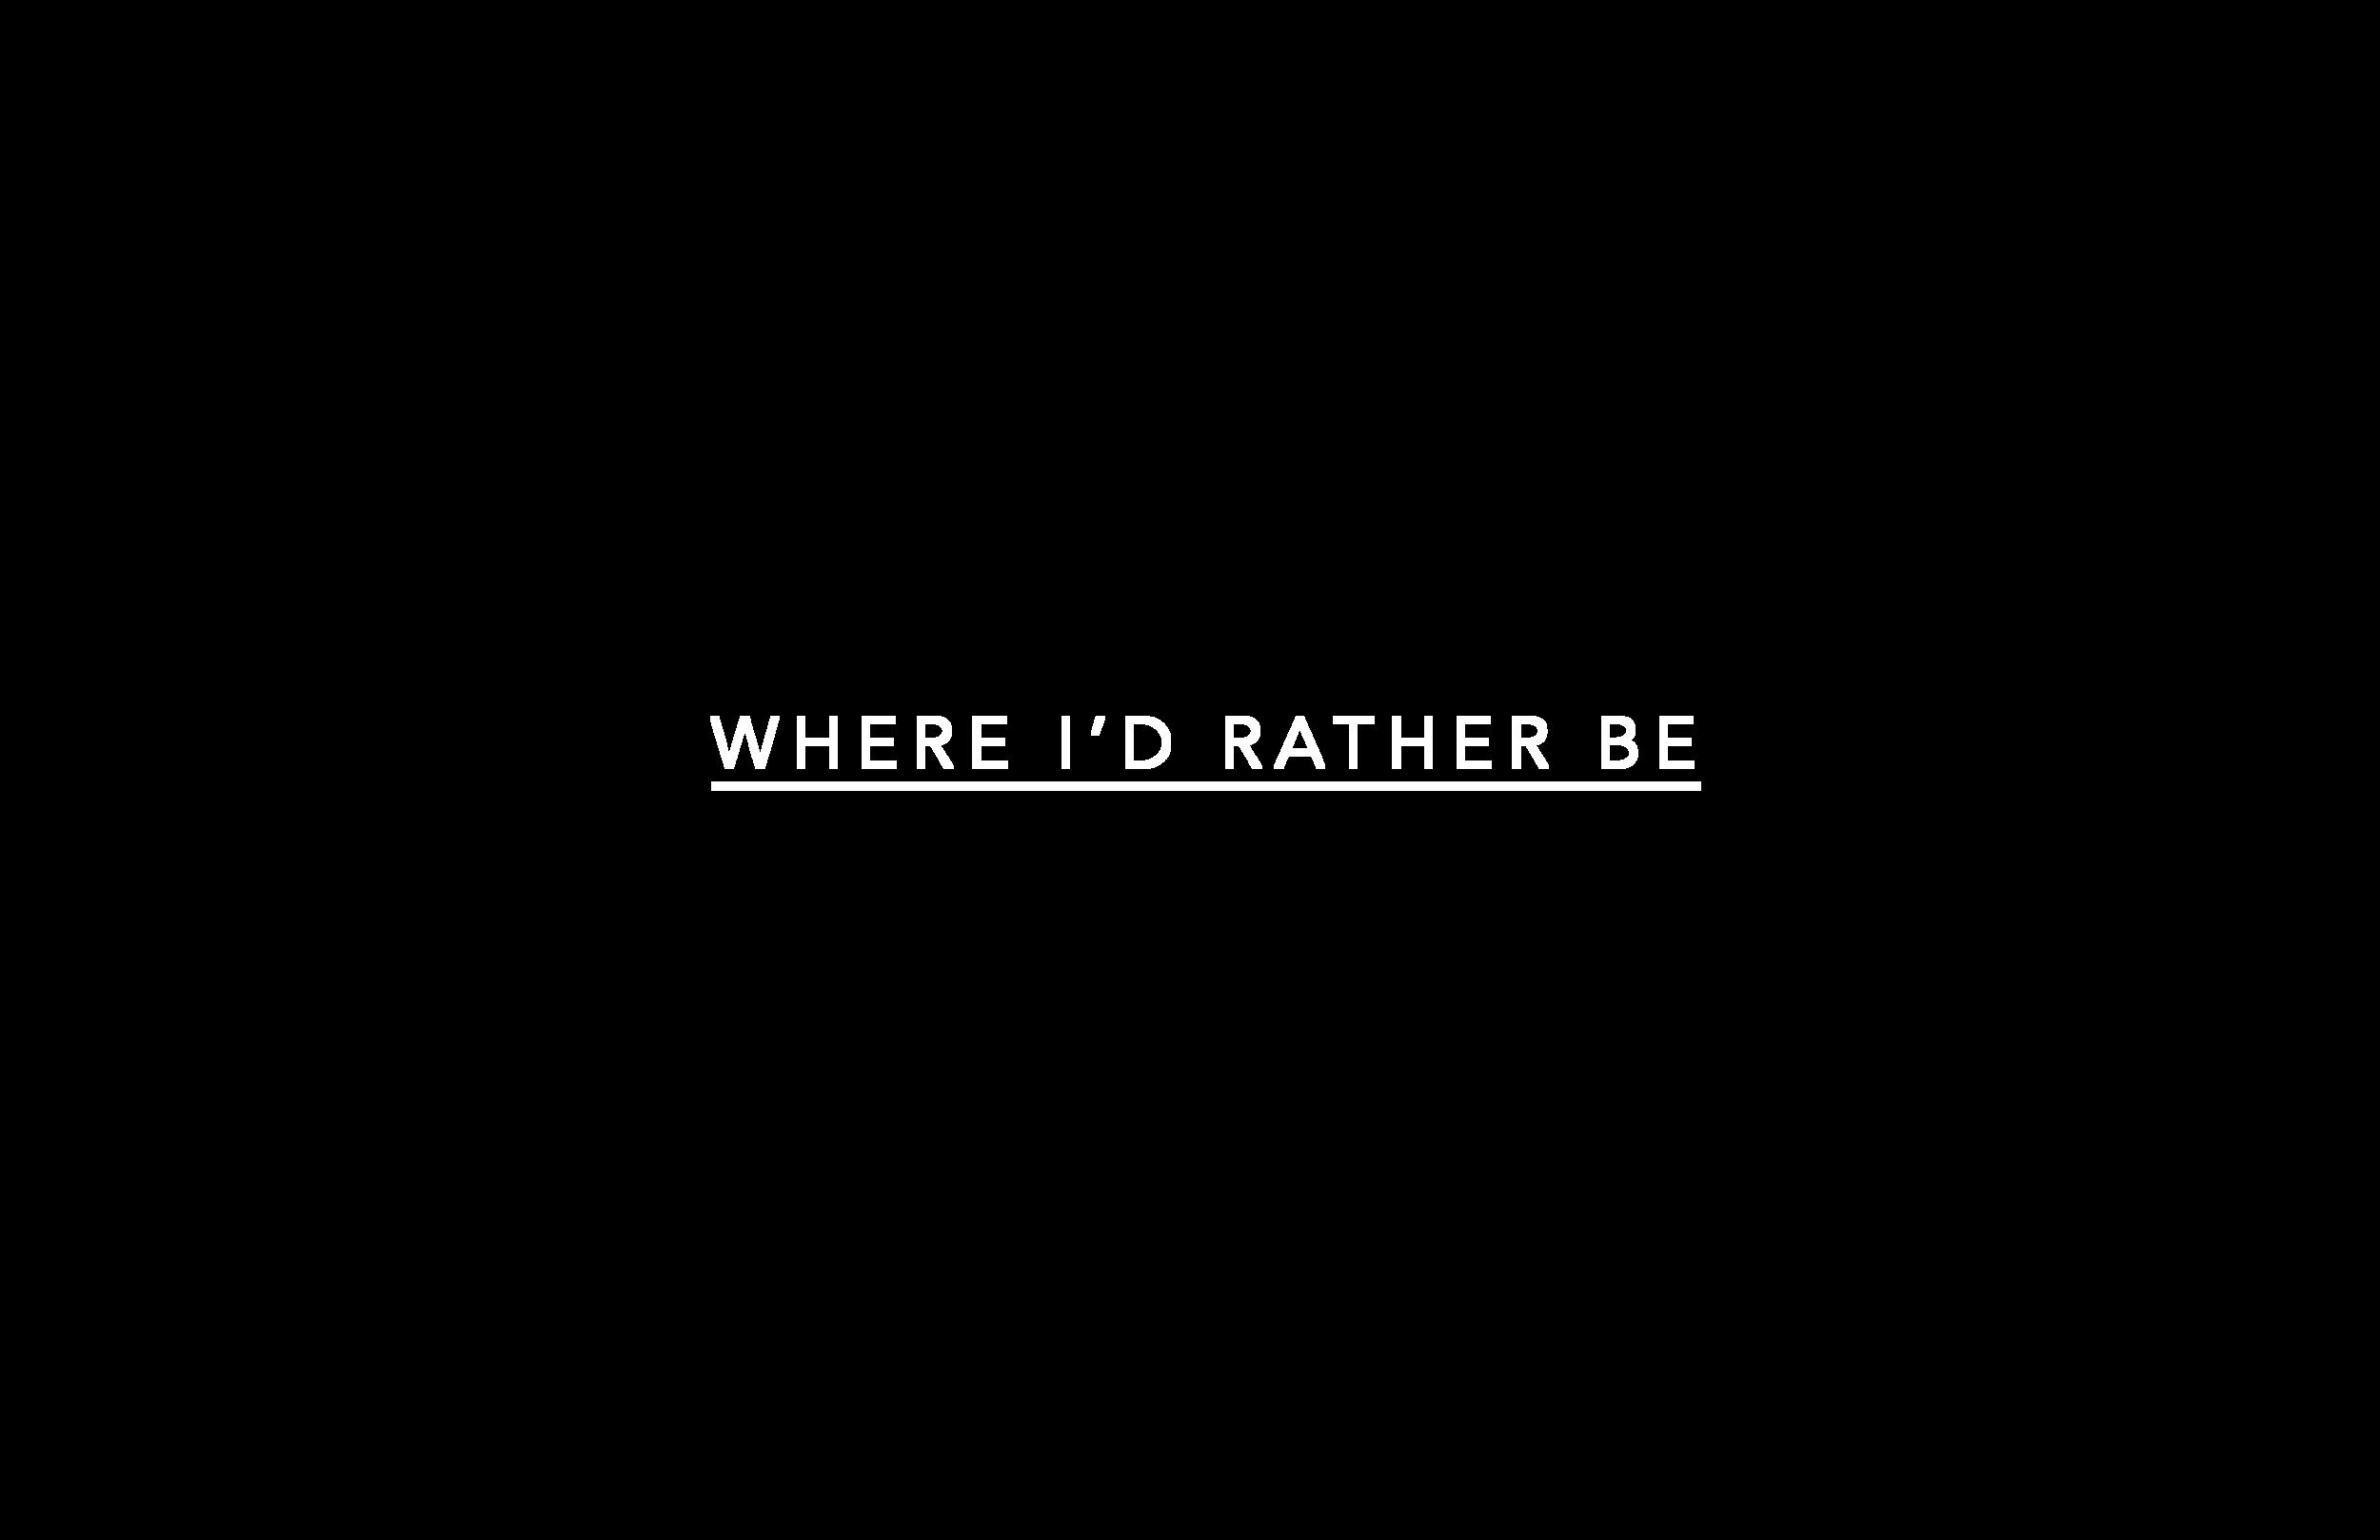 WHEREIDRATHERBE.png